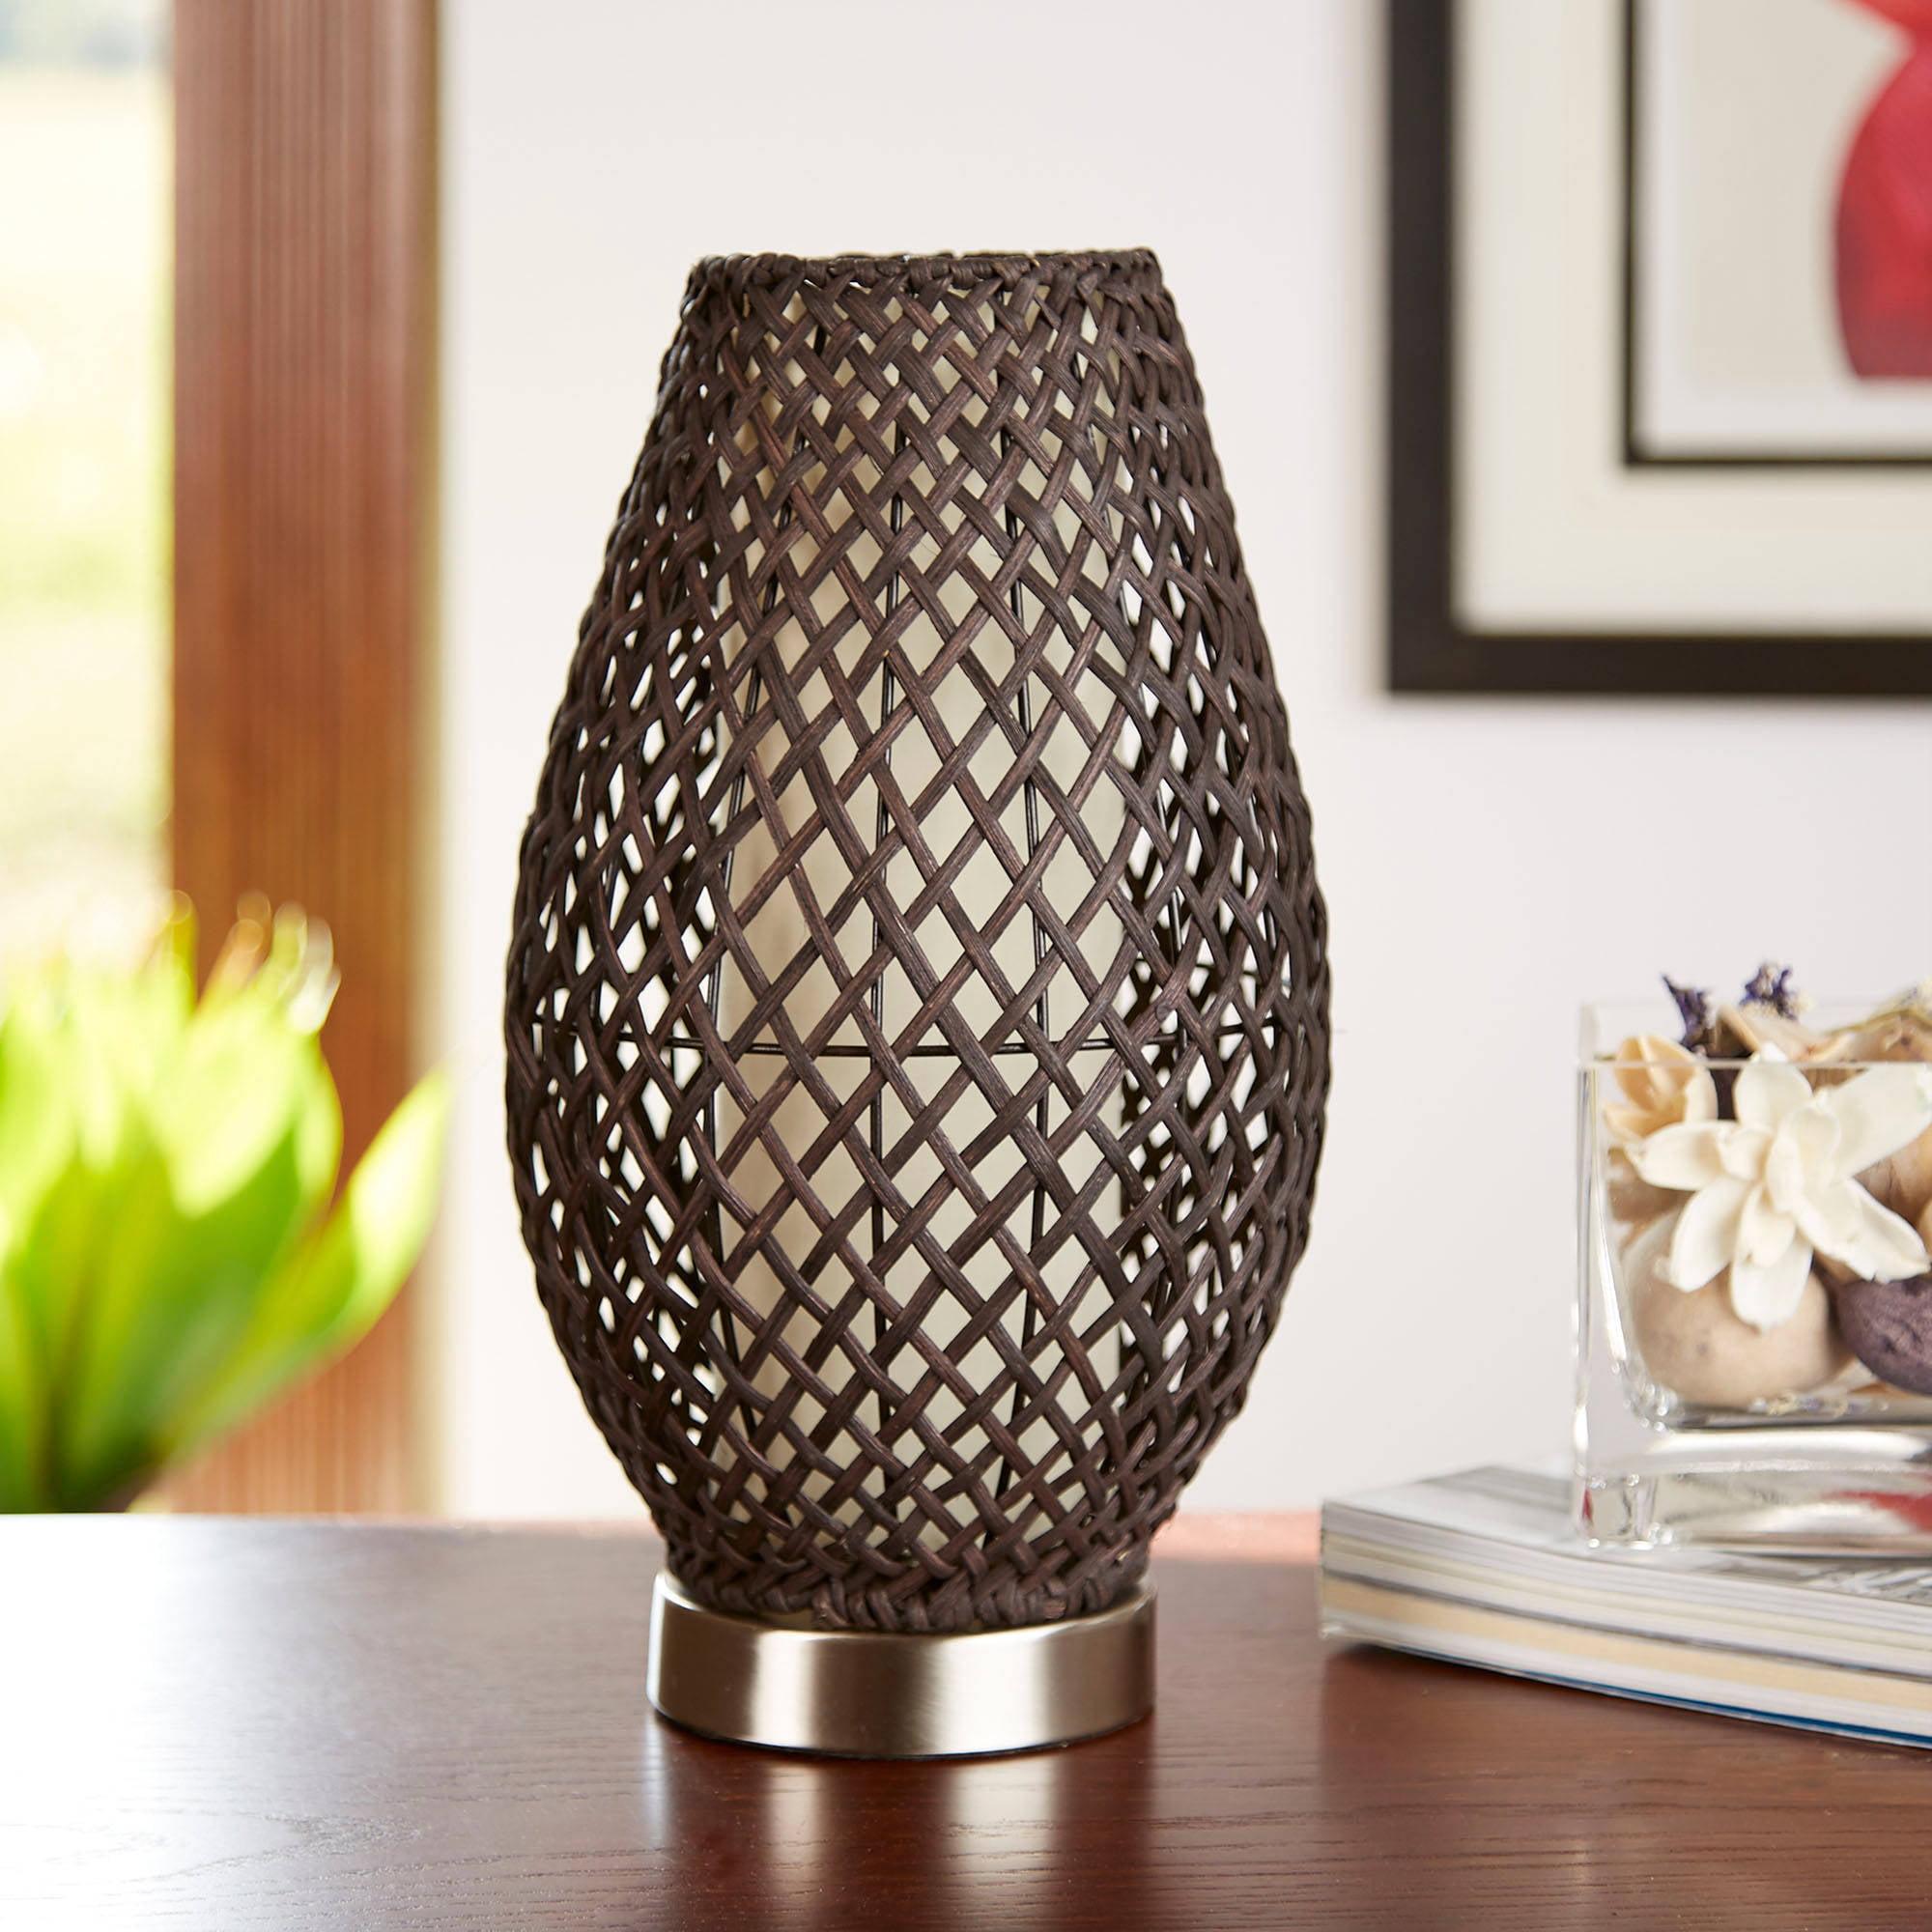 hometrends dark brown rattan accent lamp walmart com